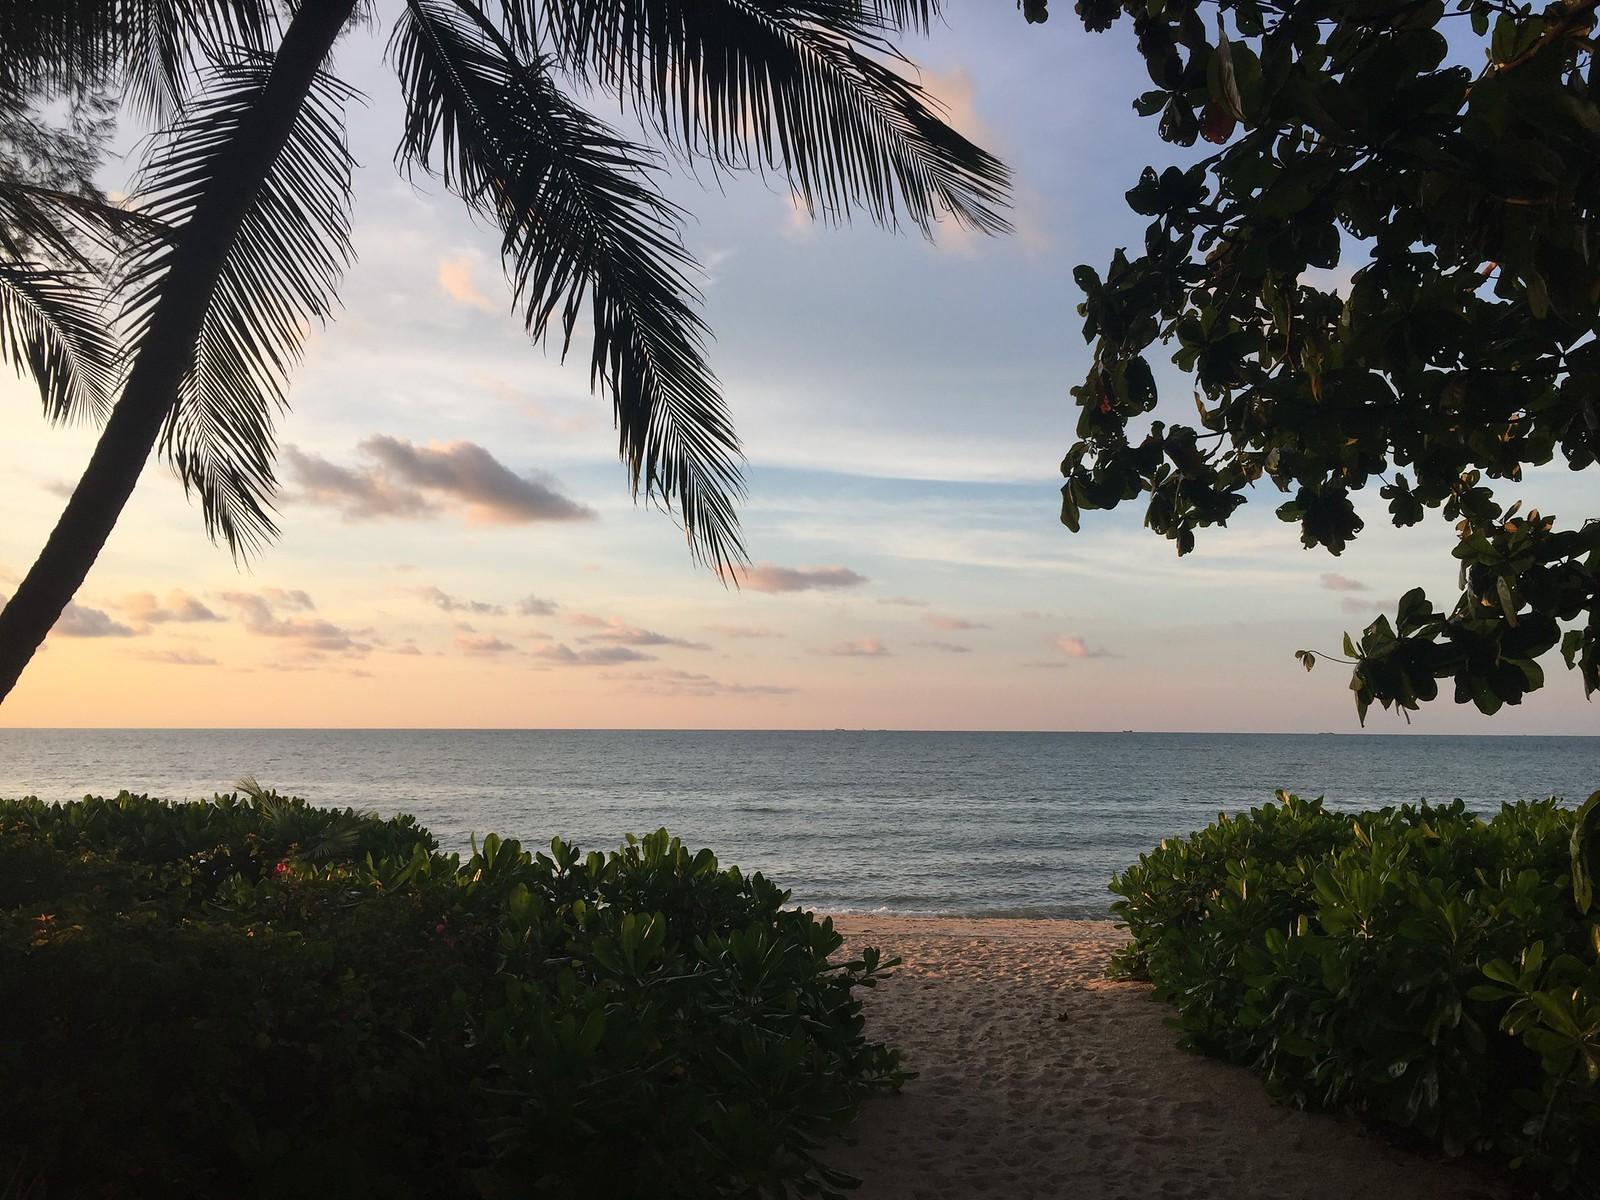 Sunset on Batu Ferringhi Beach